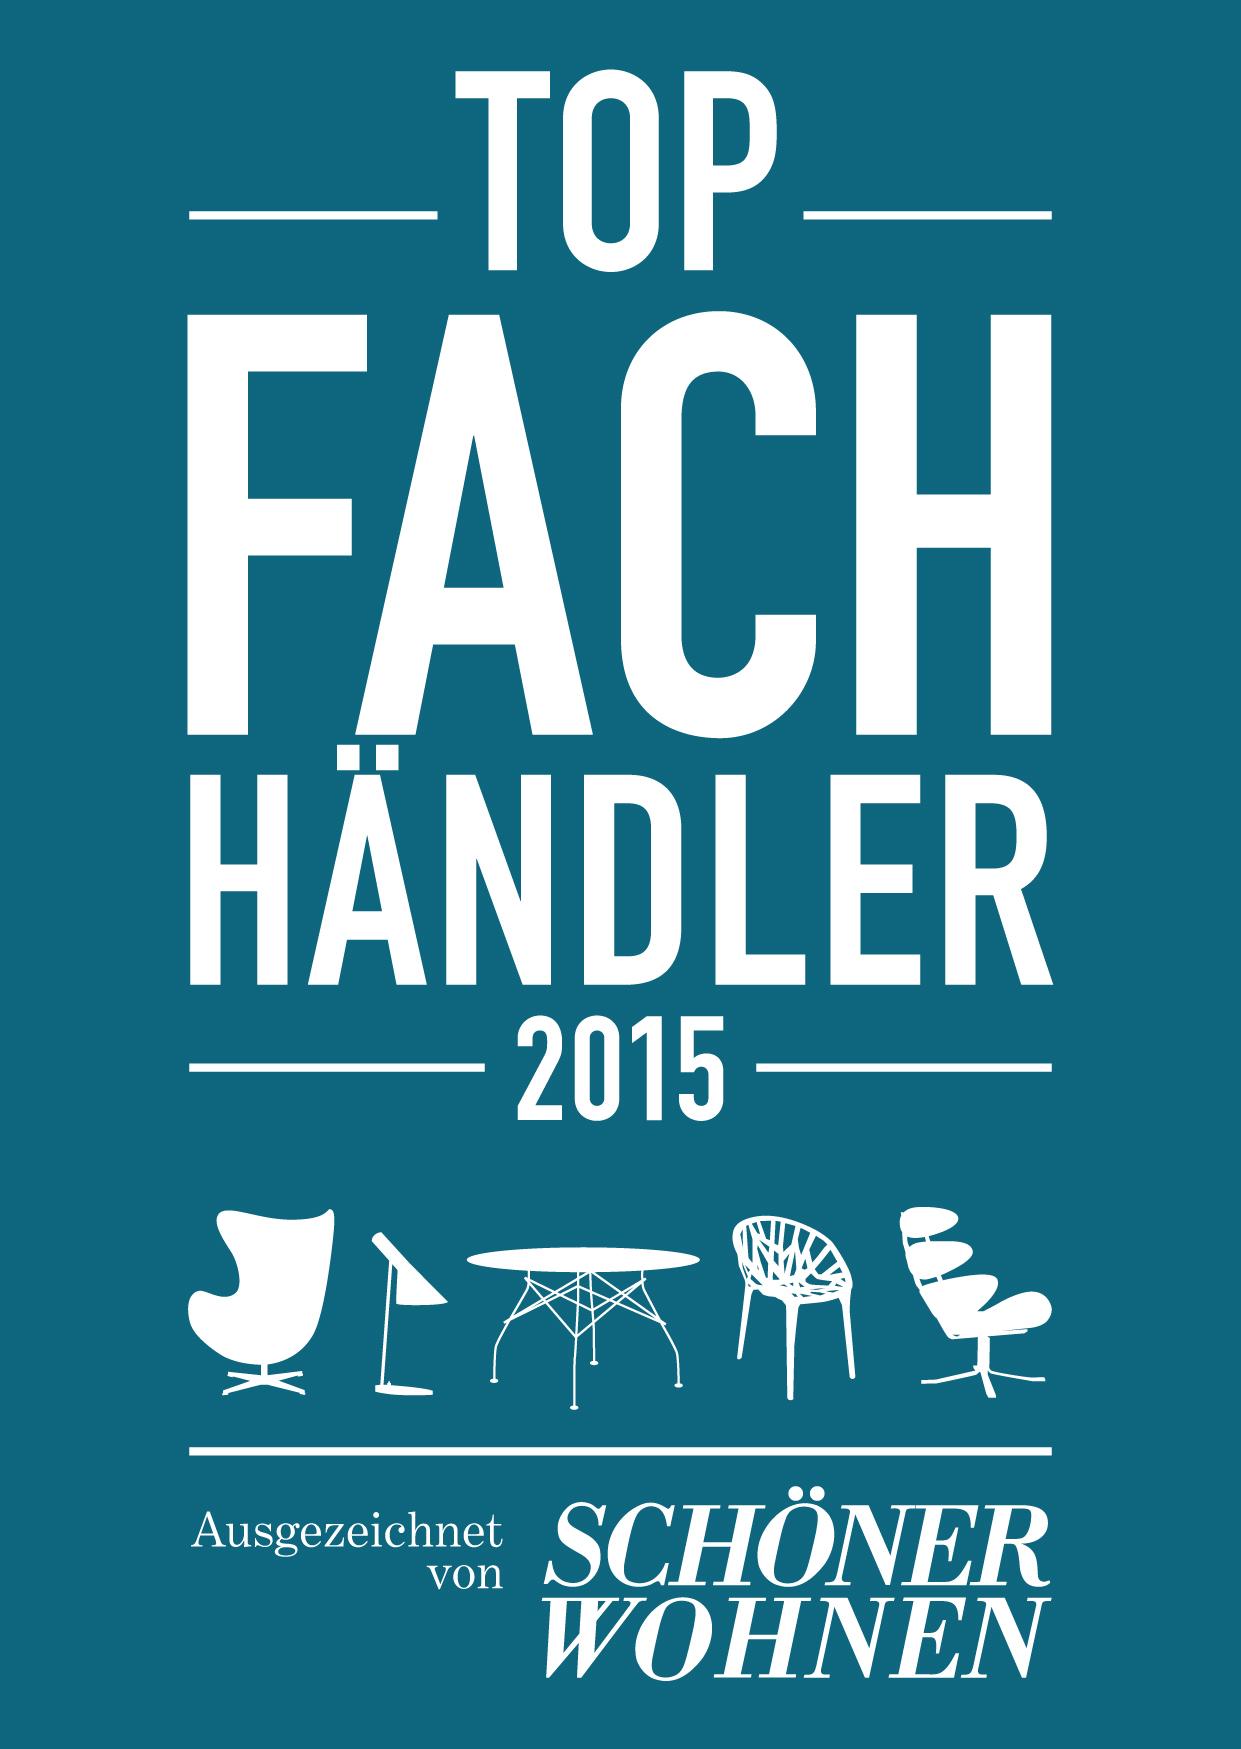 Top-Fachhändler_2015_CS6.indd